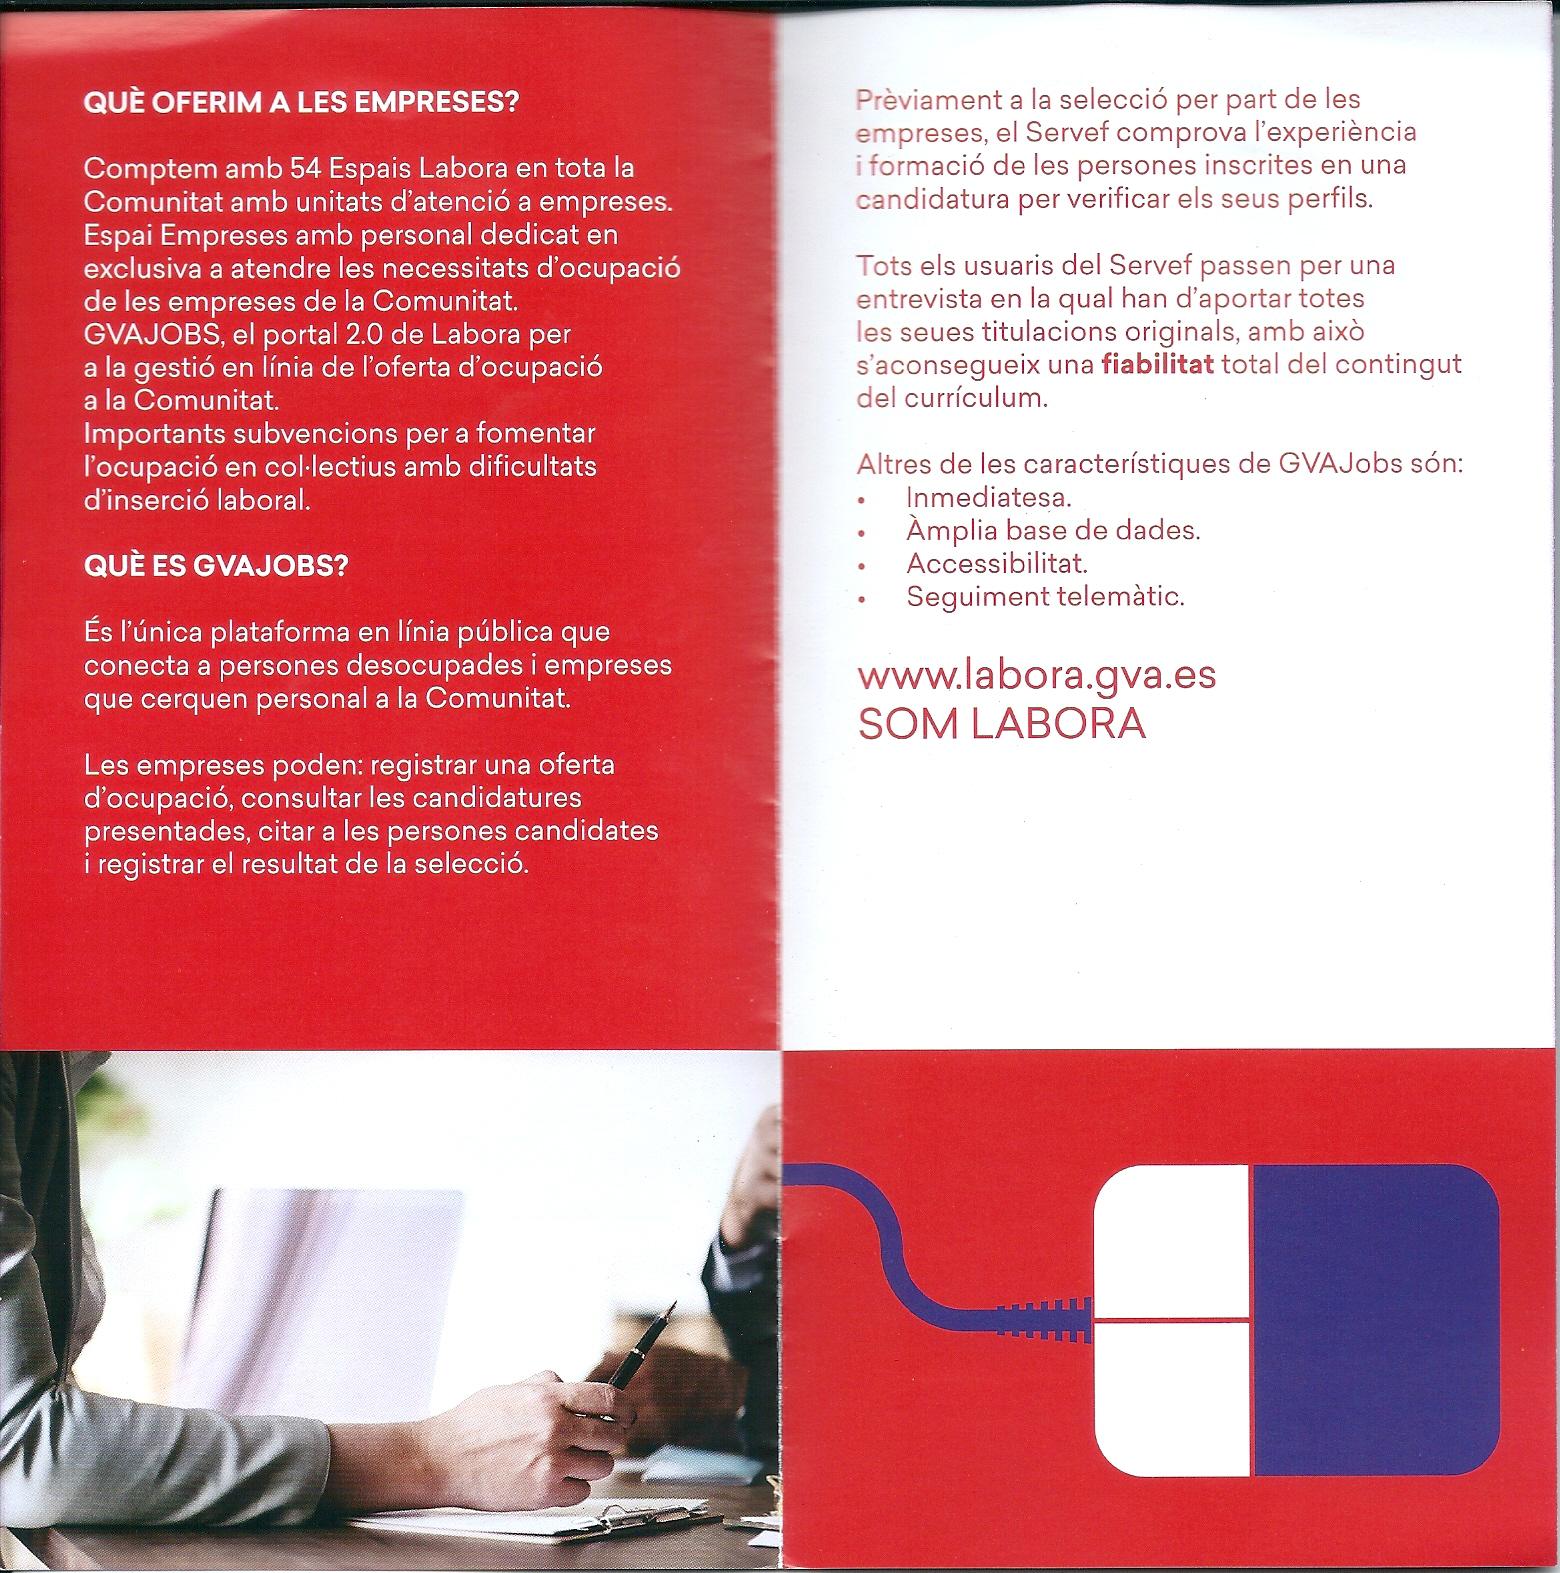 INFORMACION LABORA - Labora Servef